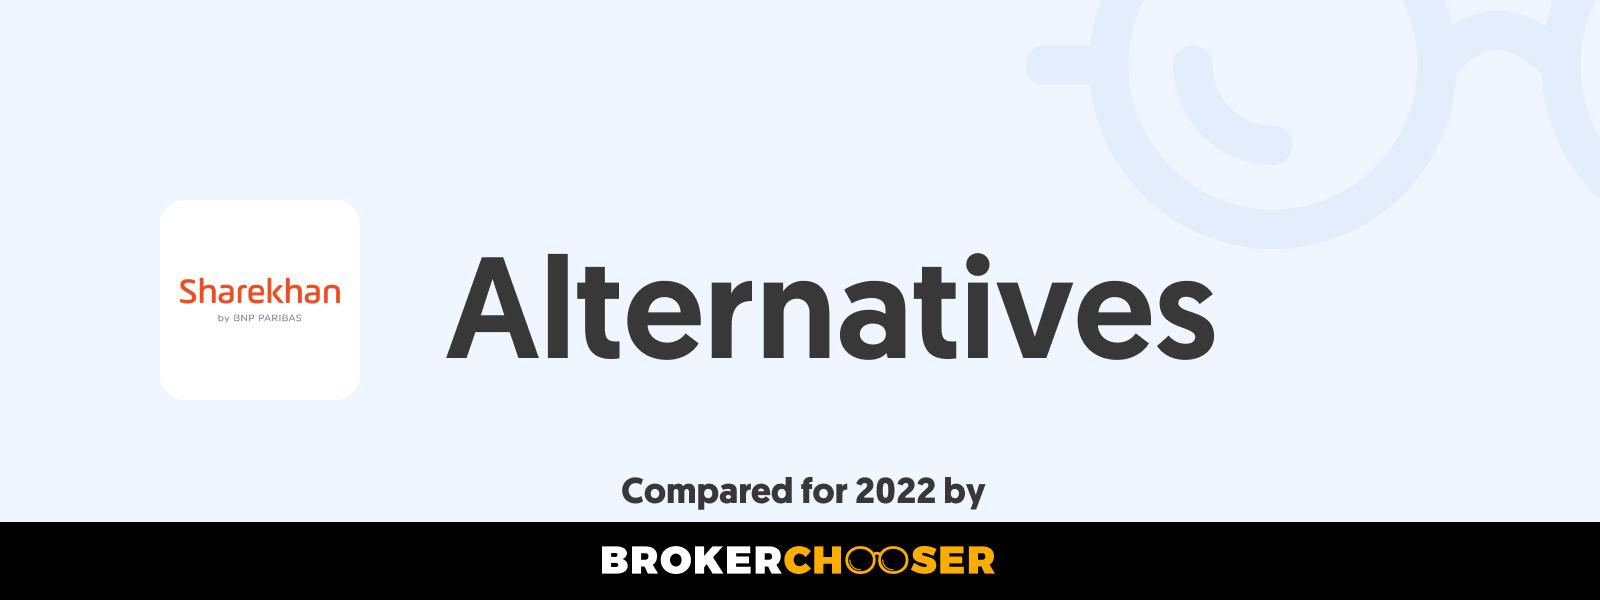 Sharekhan Alternatives